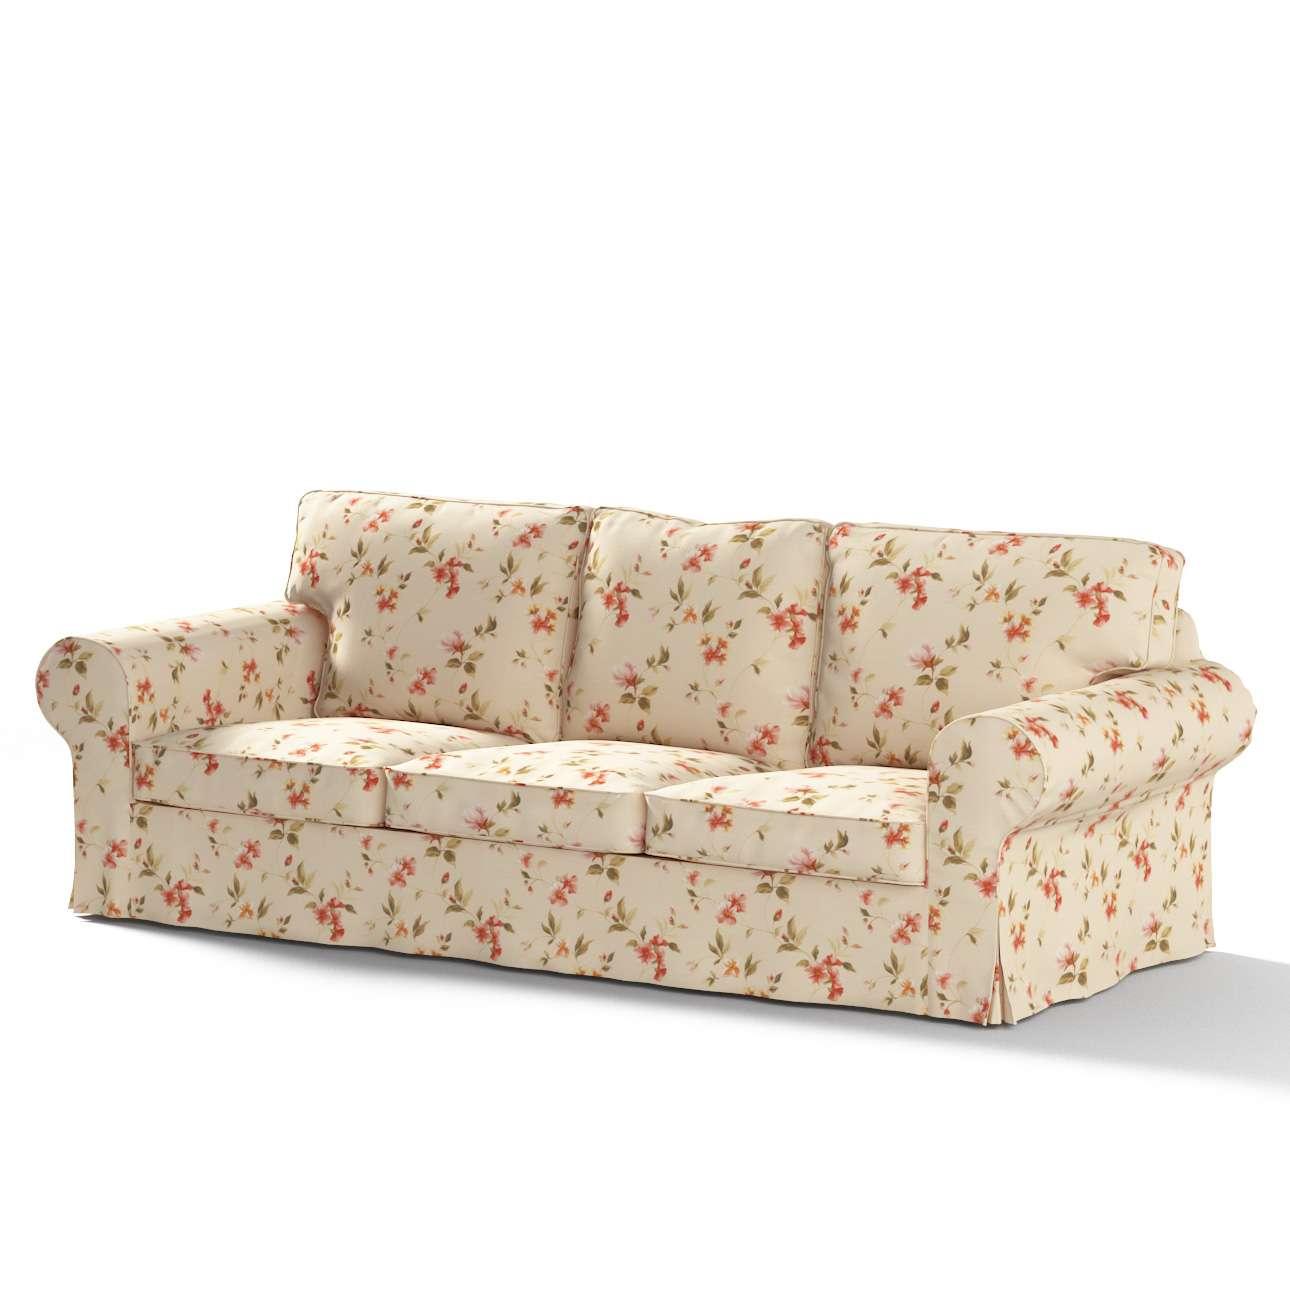 Ektorp 3-Sitzer Schlafsofabezug, ALTES Modell Sofahusse Ektorp 3-Sitzer Schlafsofa von der Kollektion Londres, Stoff: 124-05